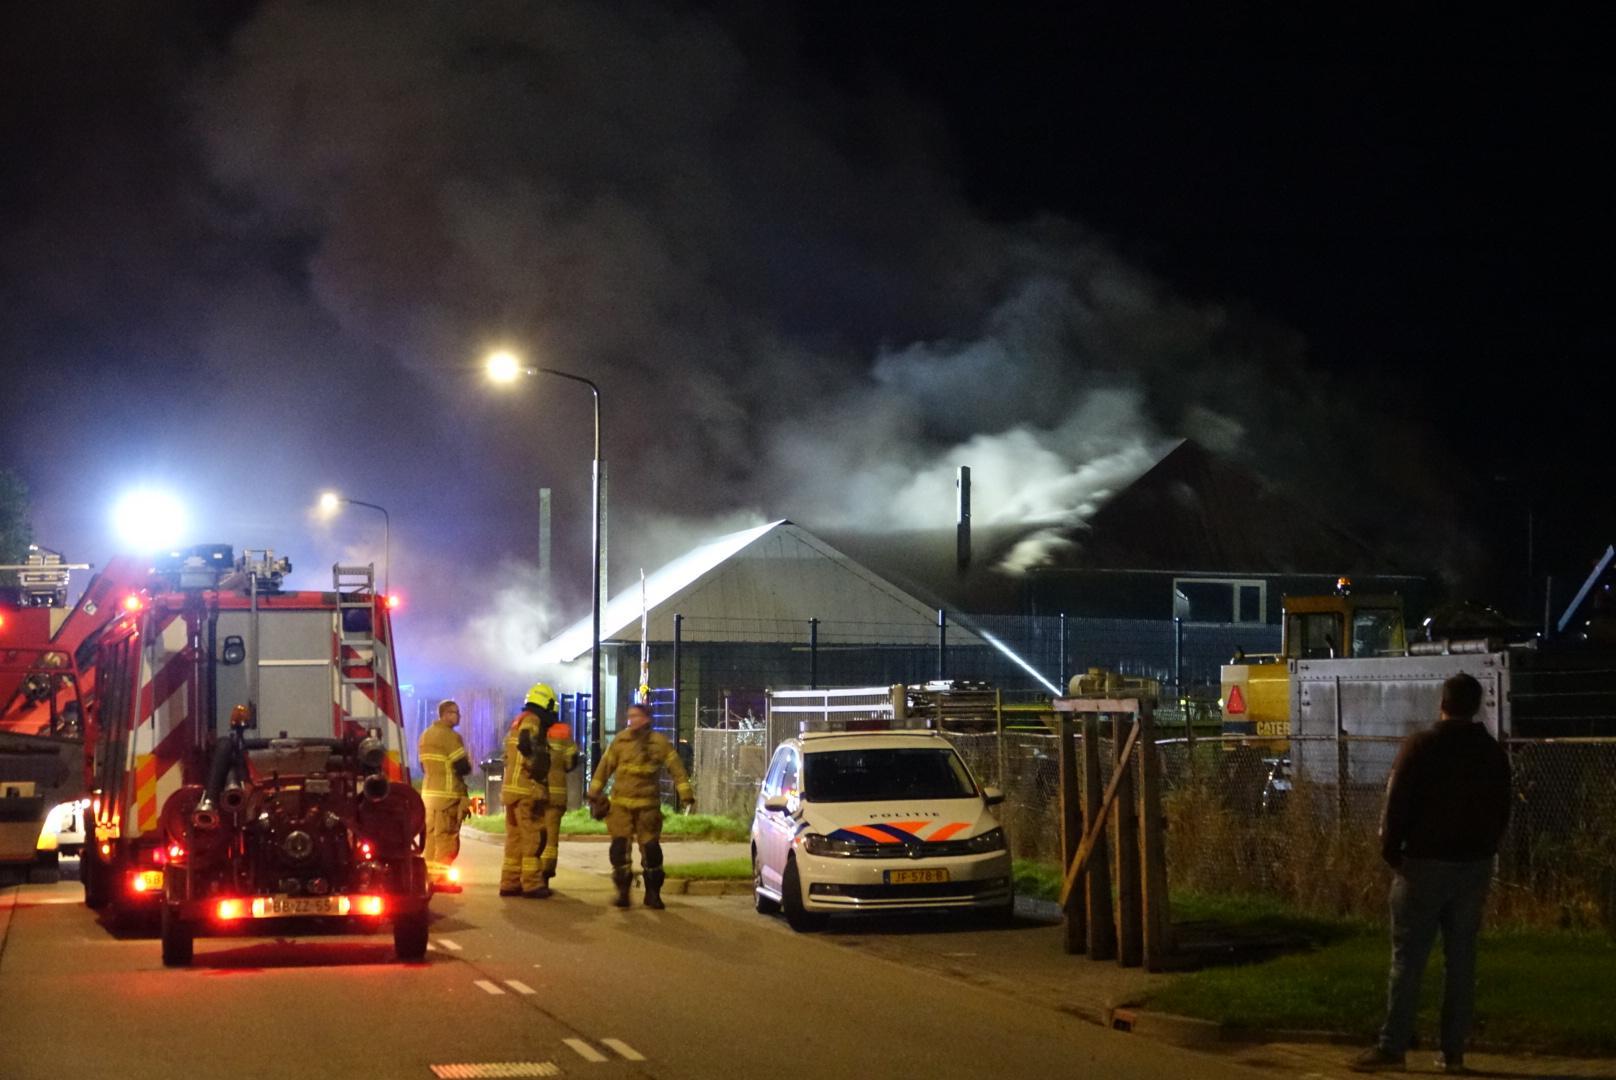 Grote schade in pand Schagen na uitslaande brand, niemand gewond